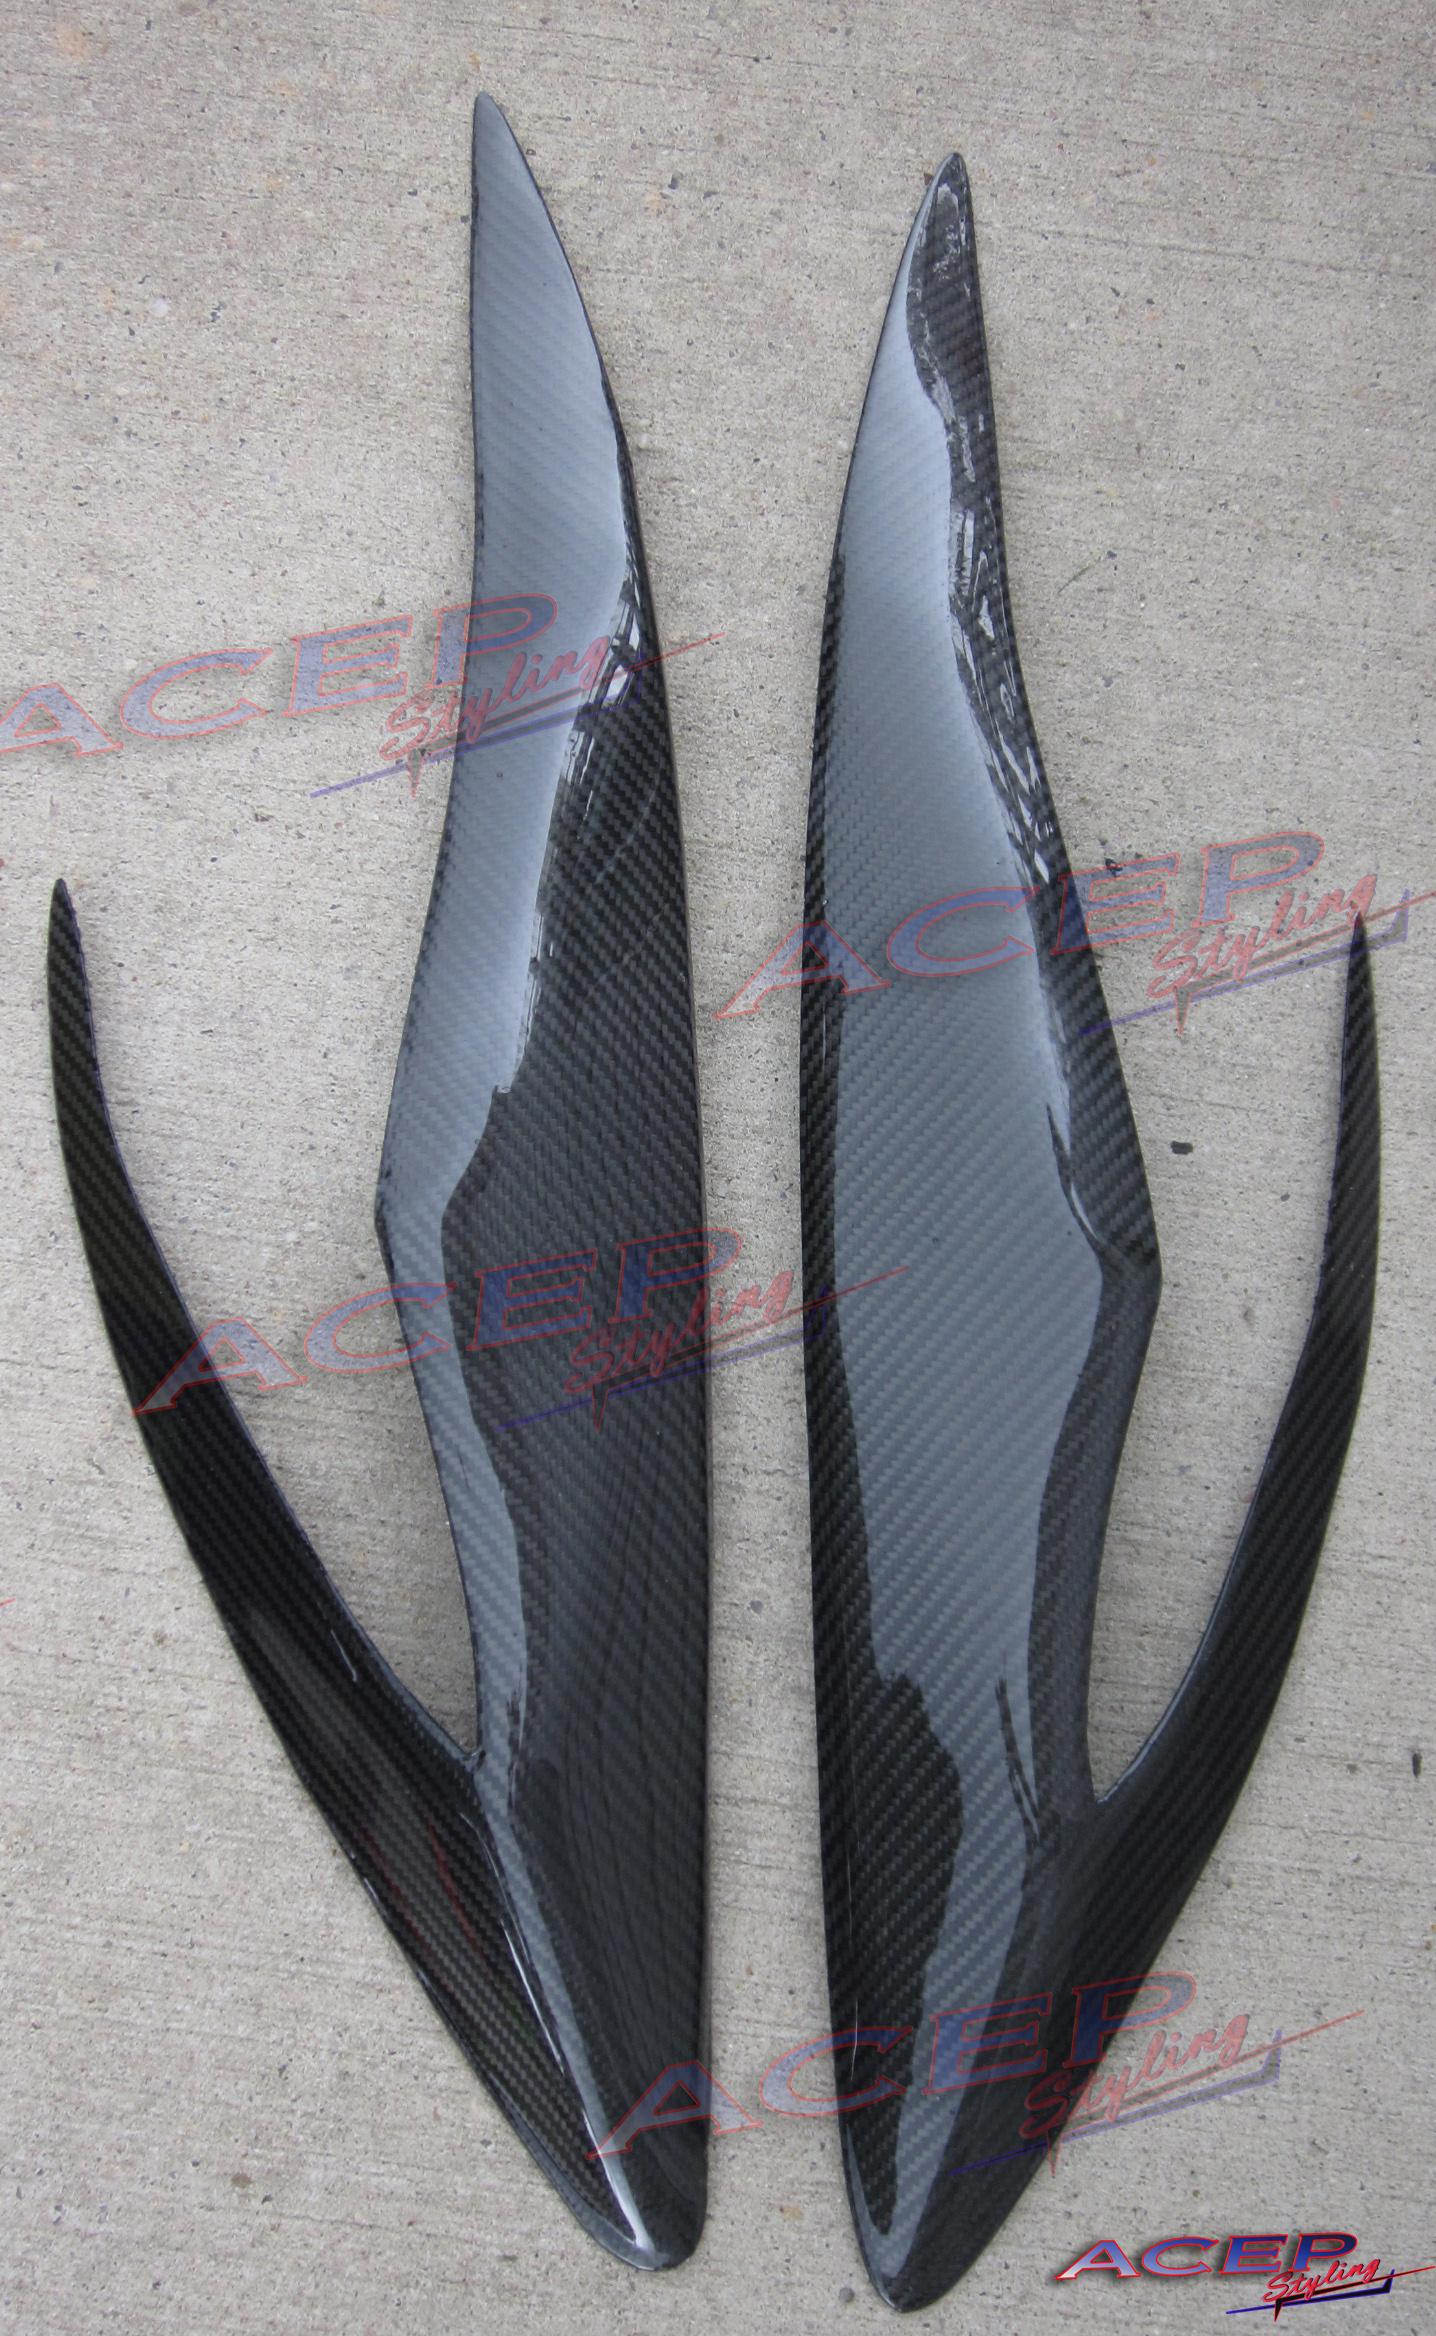 dragonx-cf2.jpg, mazda , carbon fiber